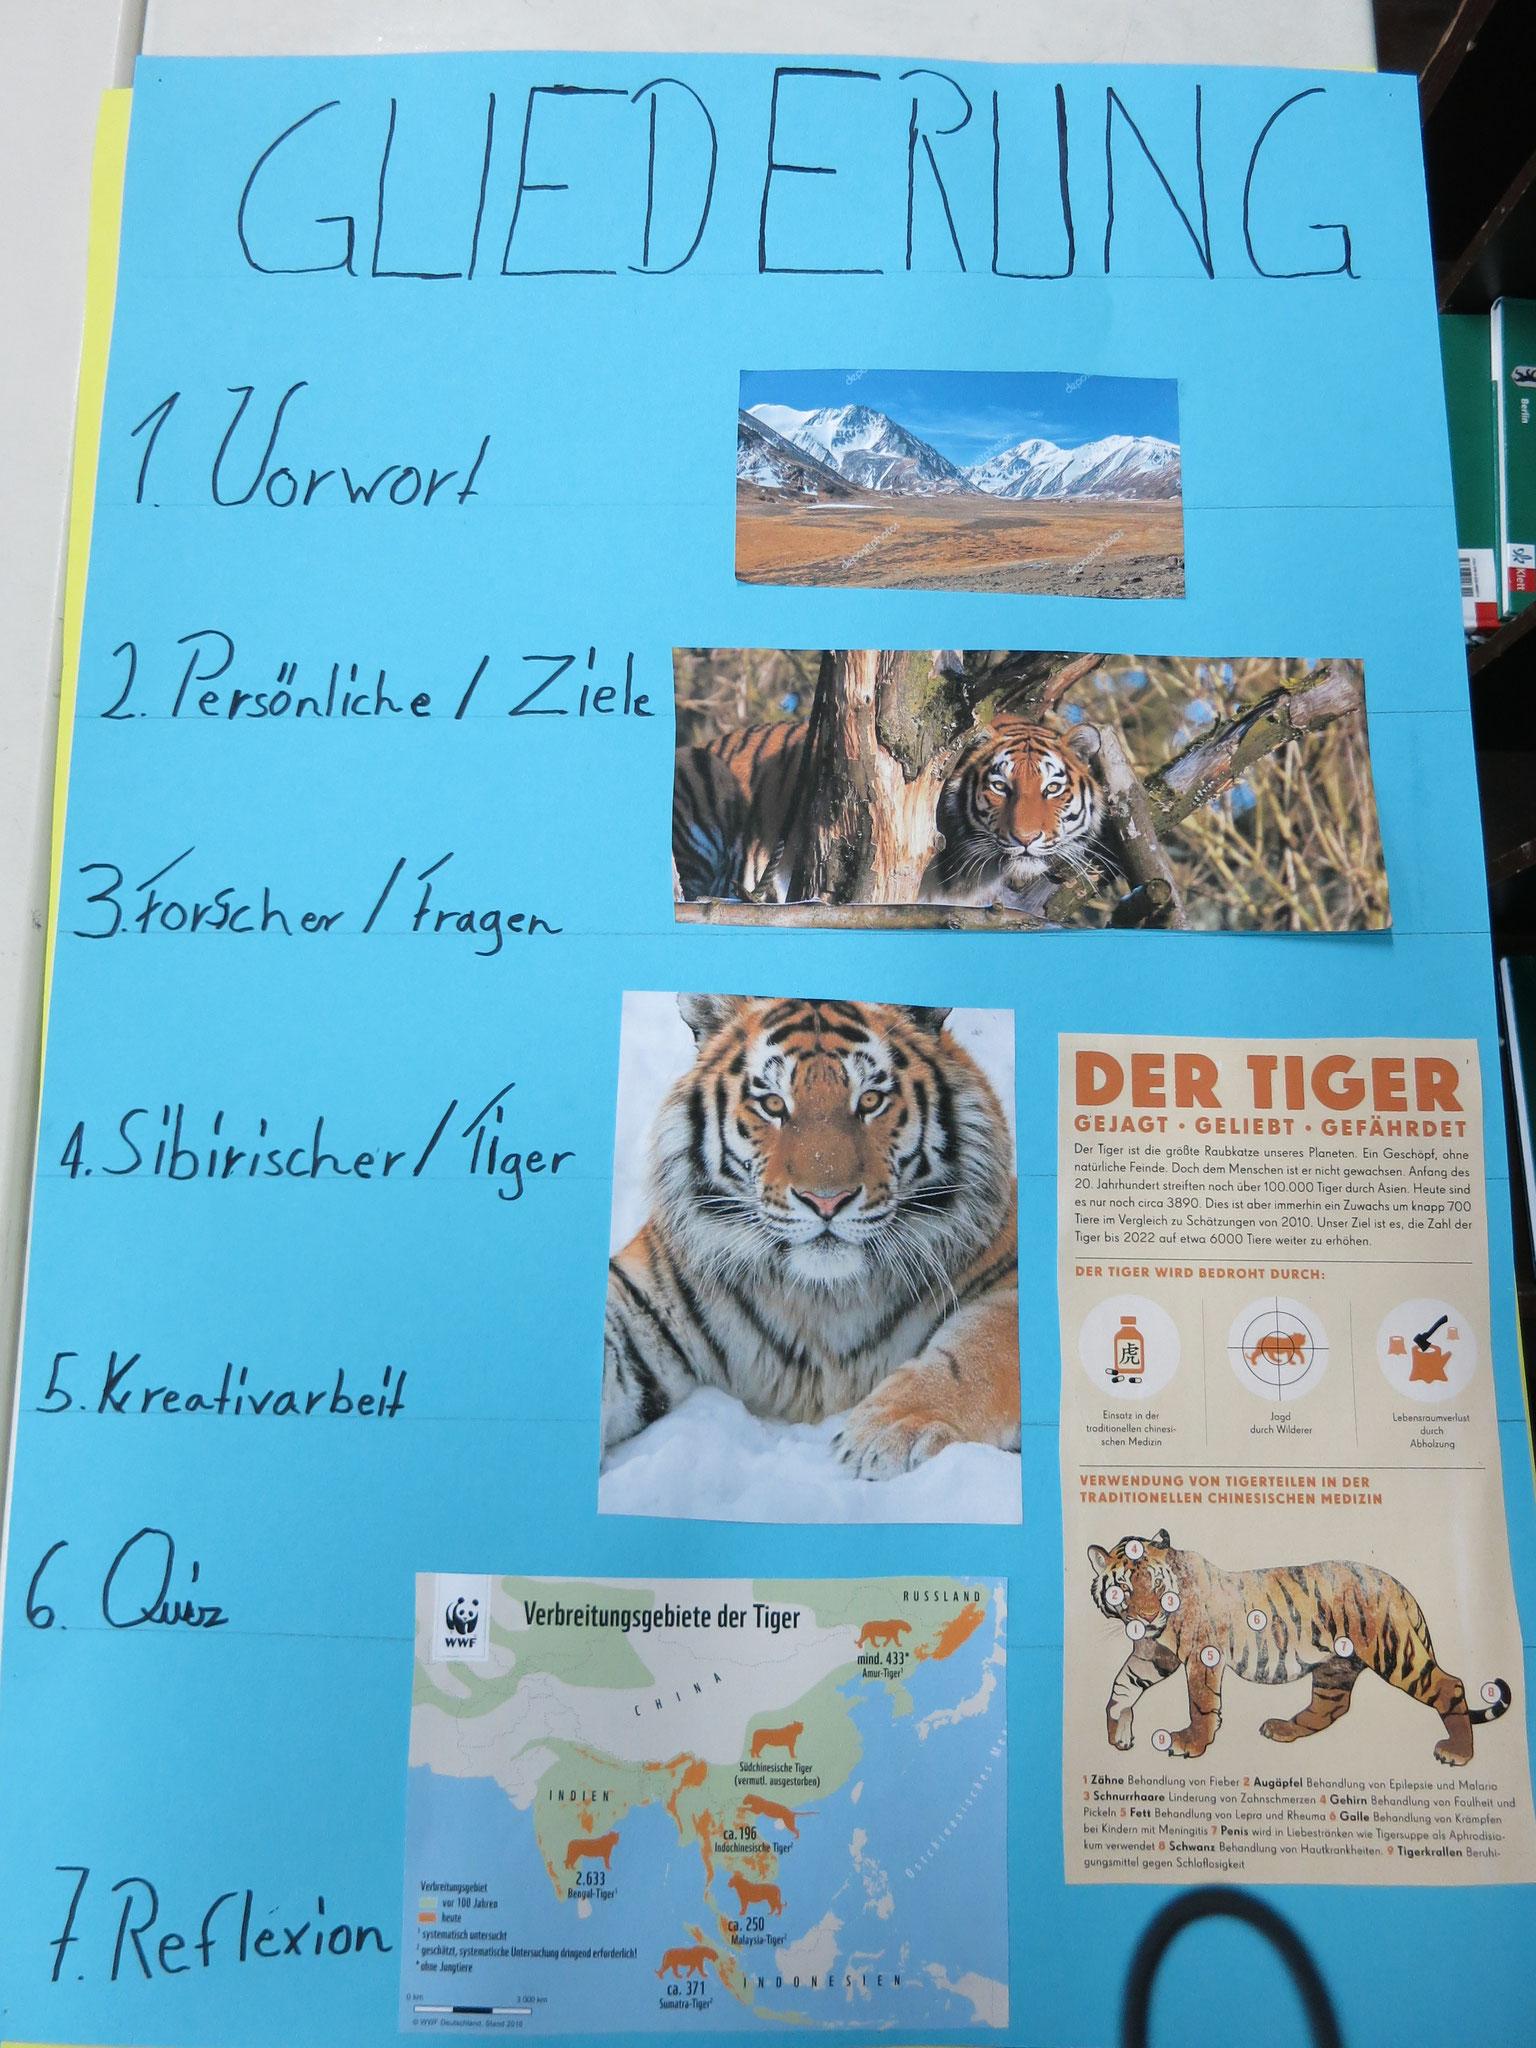 Tiger in Sibieren